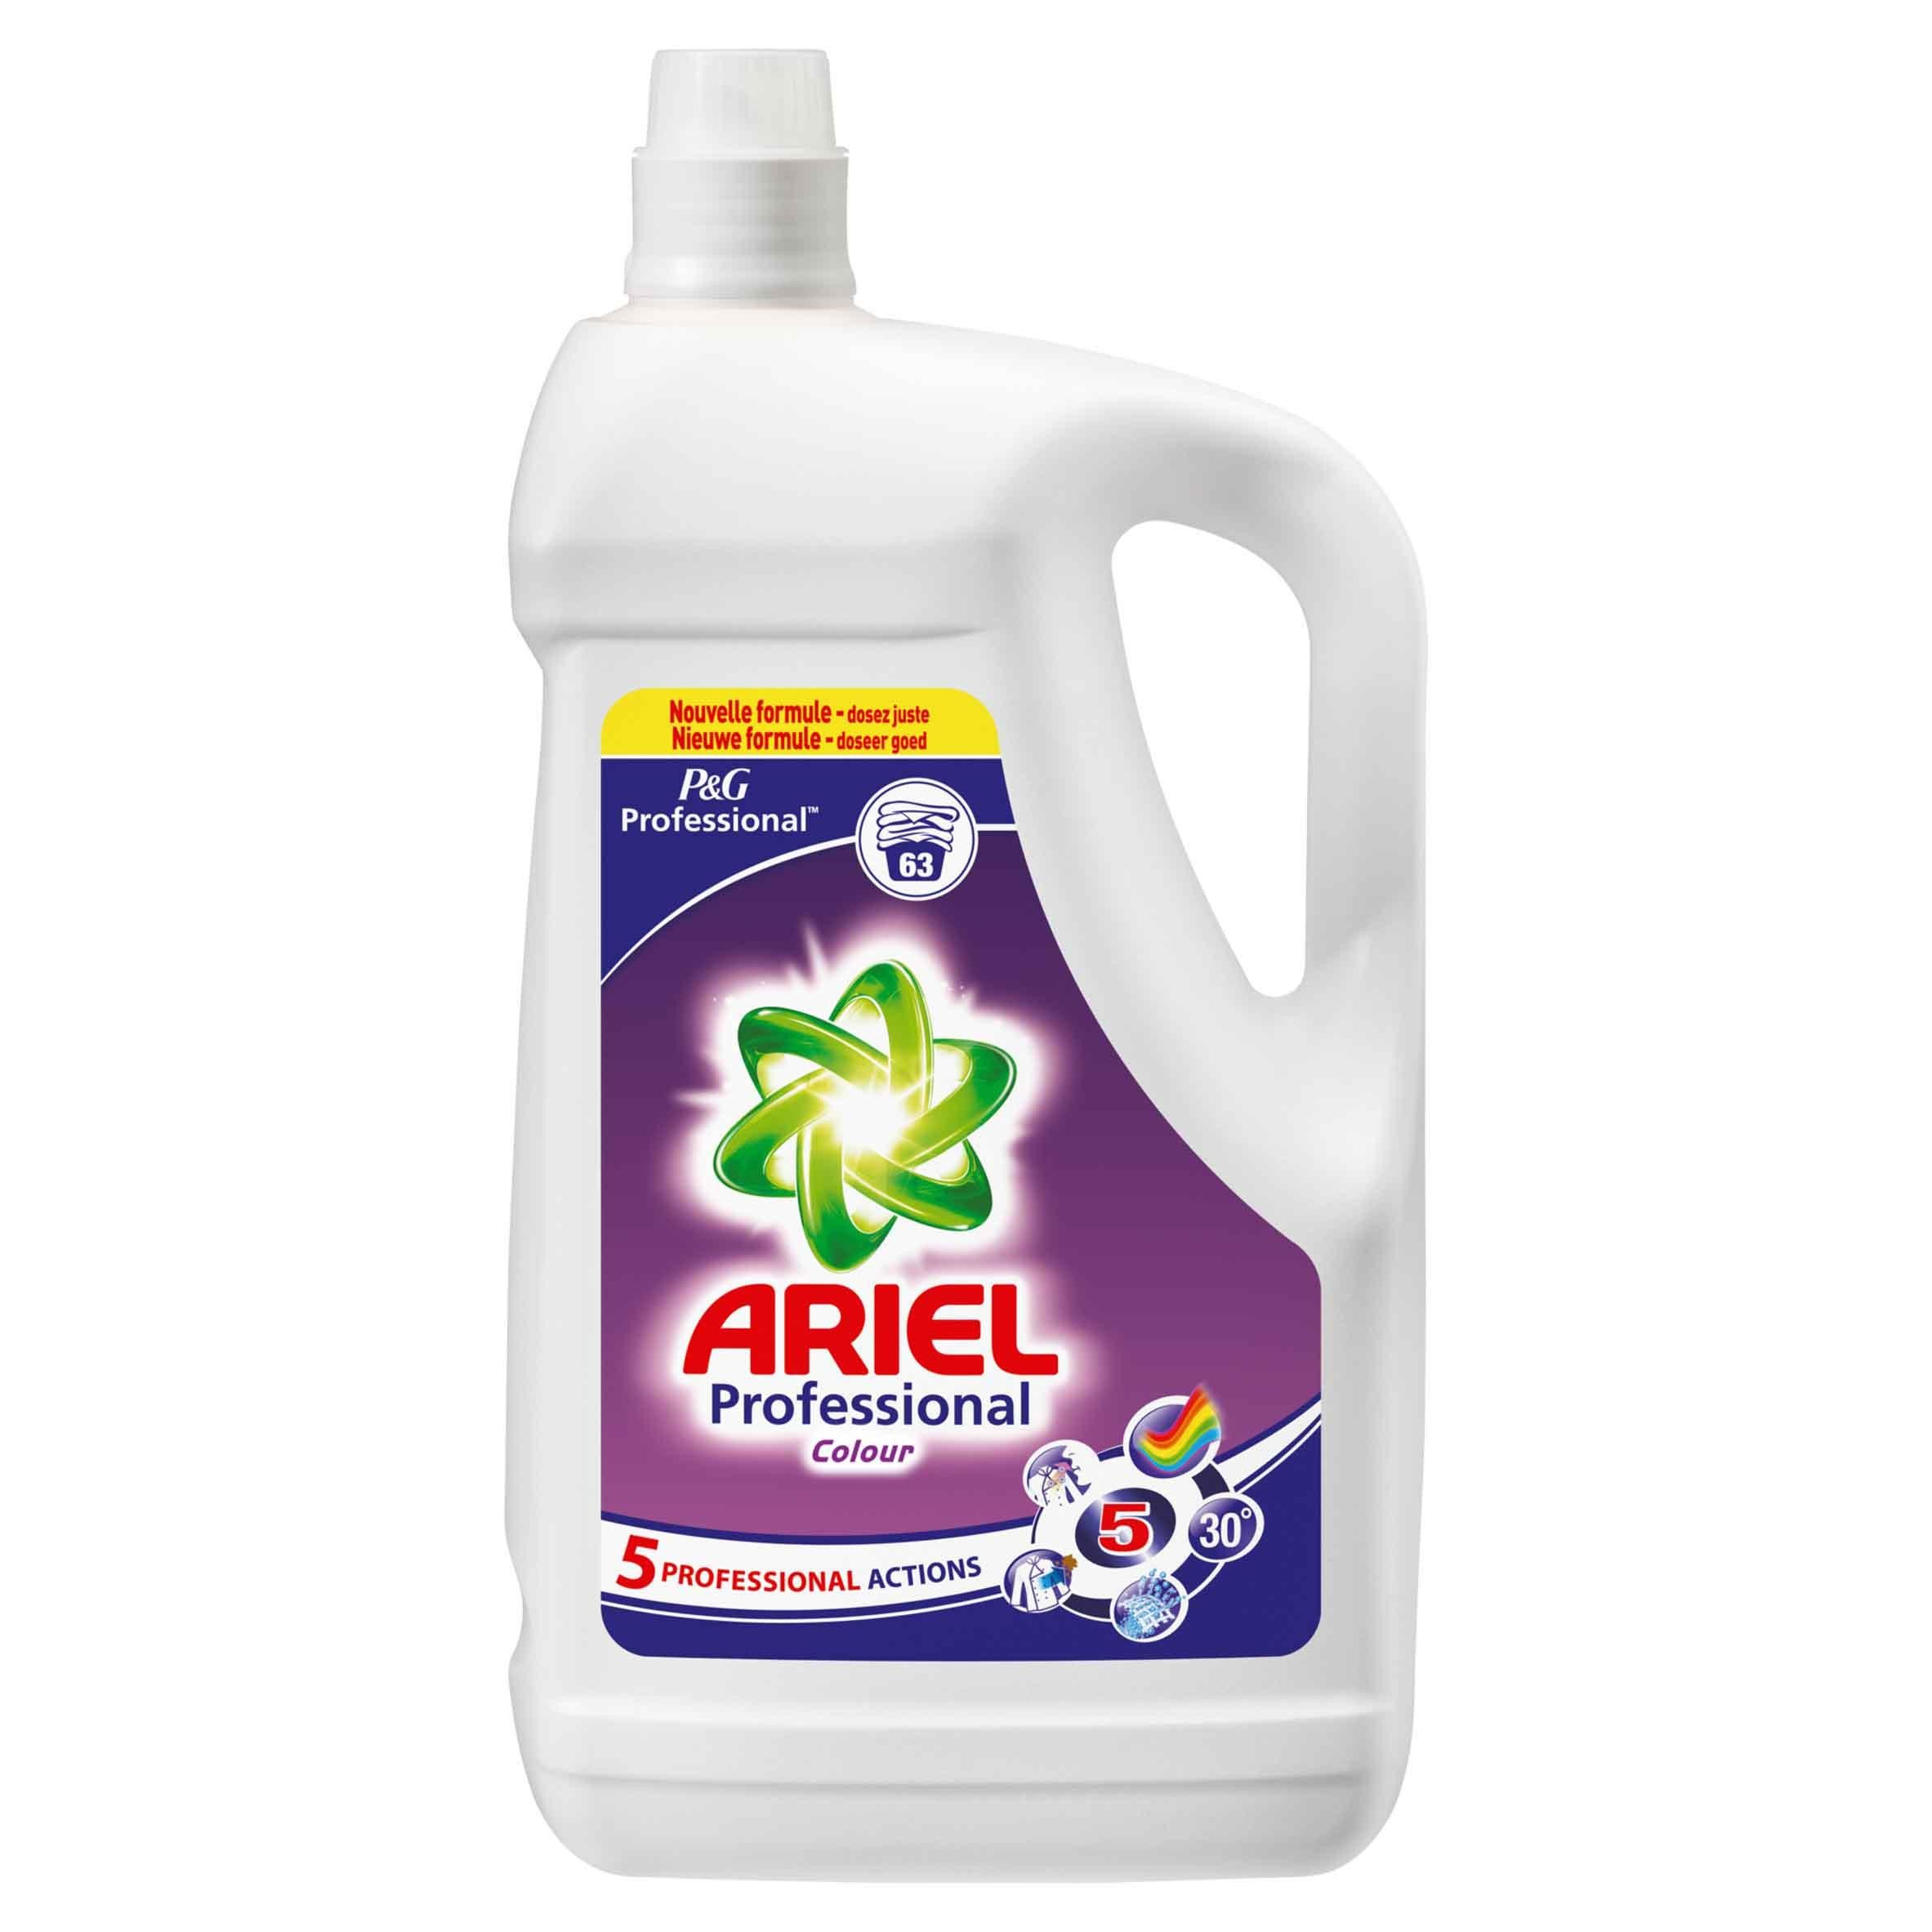 Ariel Color 63dos 4.095L vloeibaar wasmiddel P&G Professional